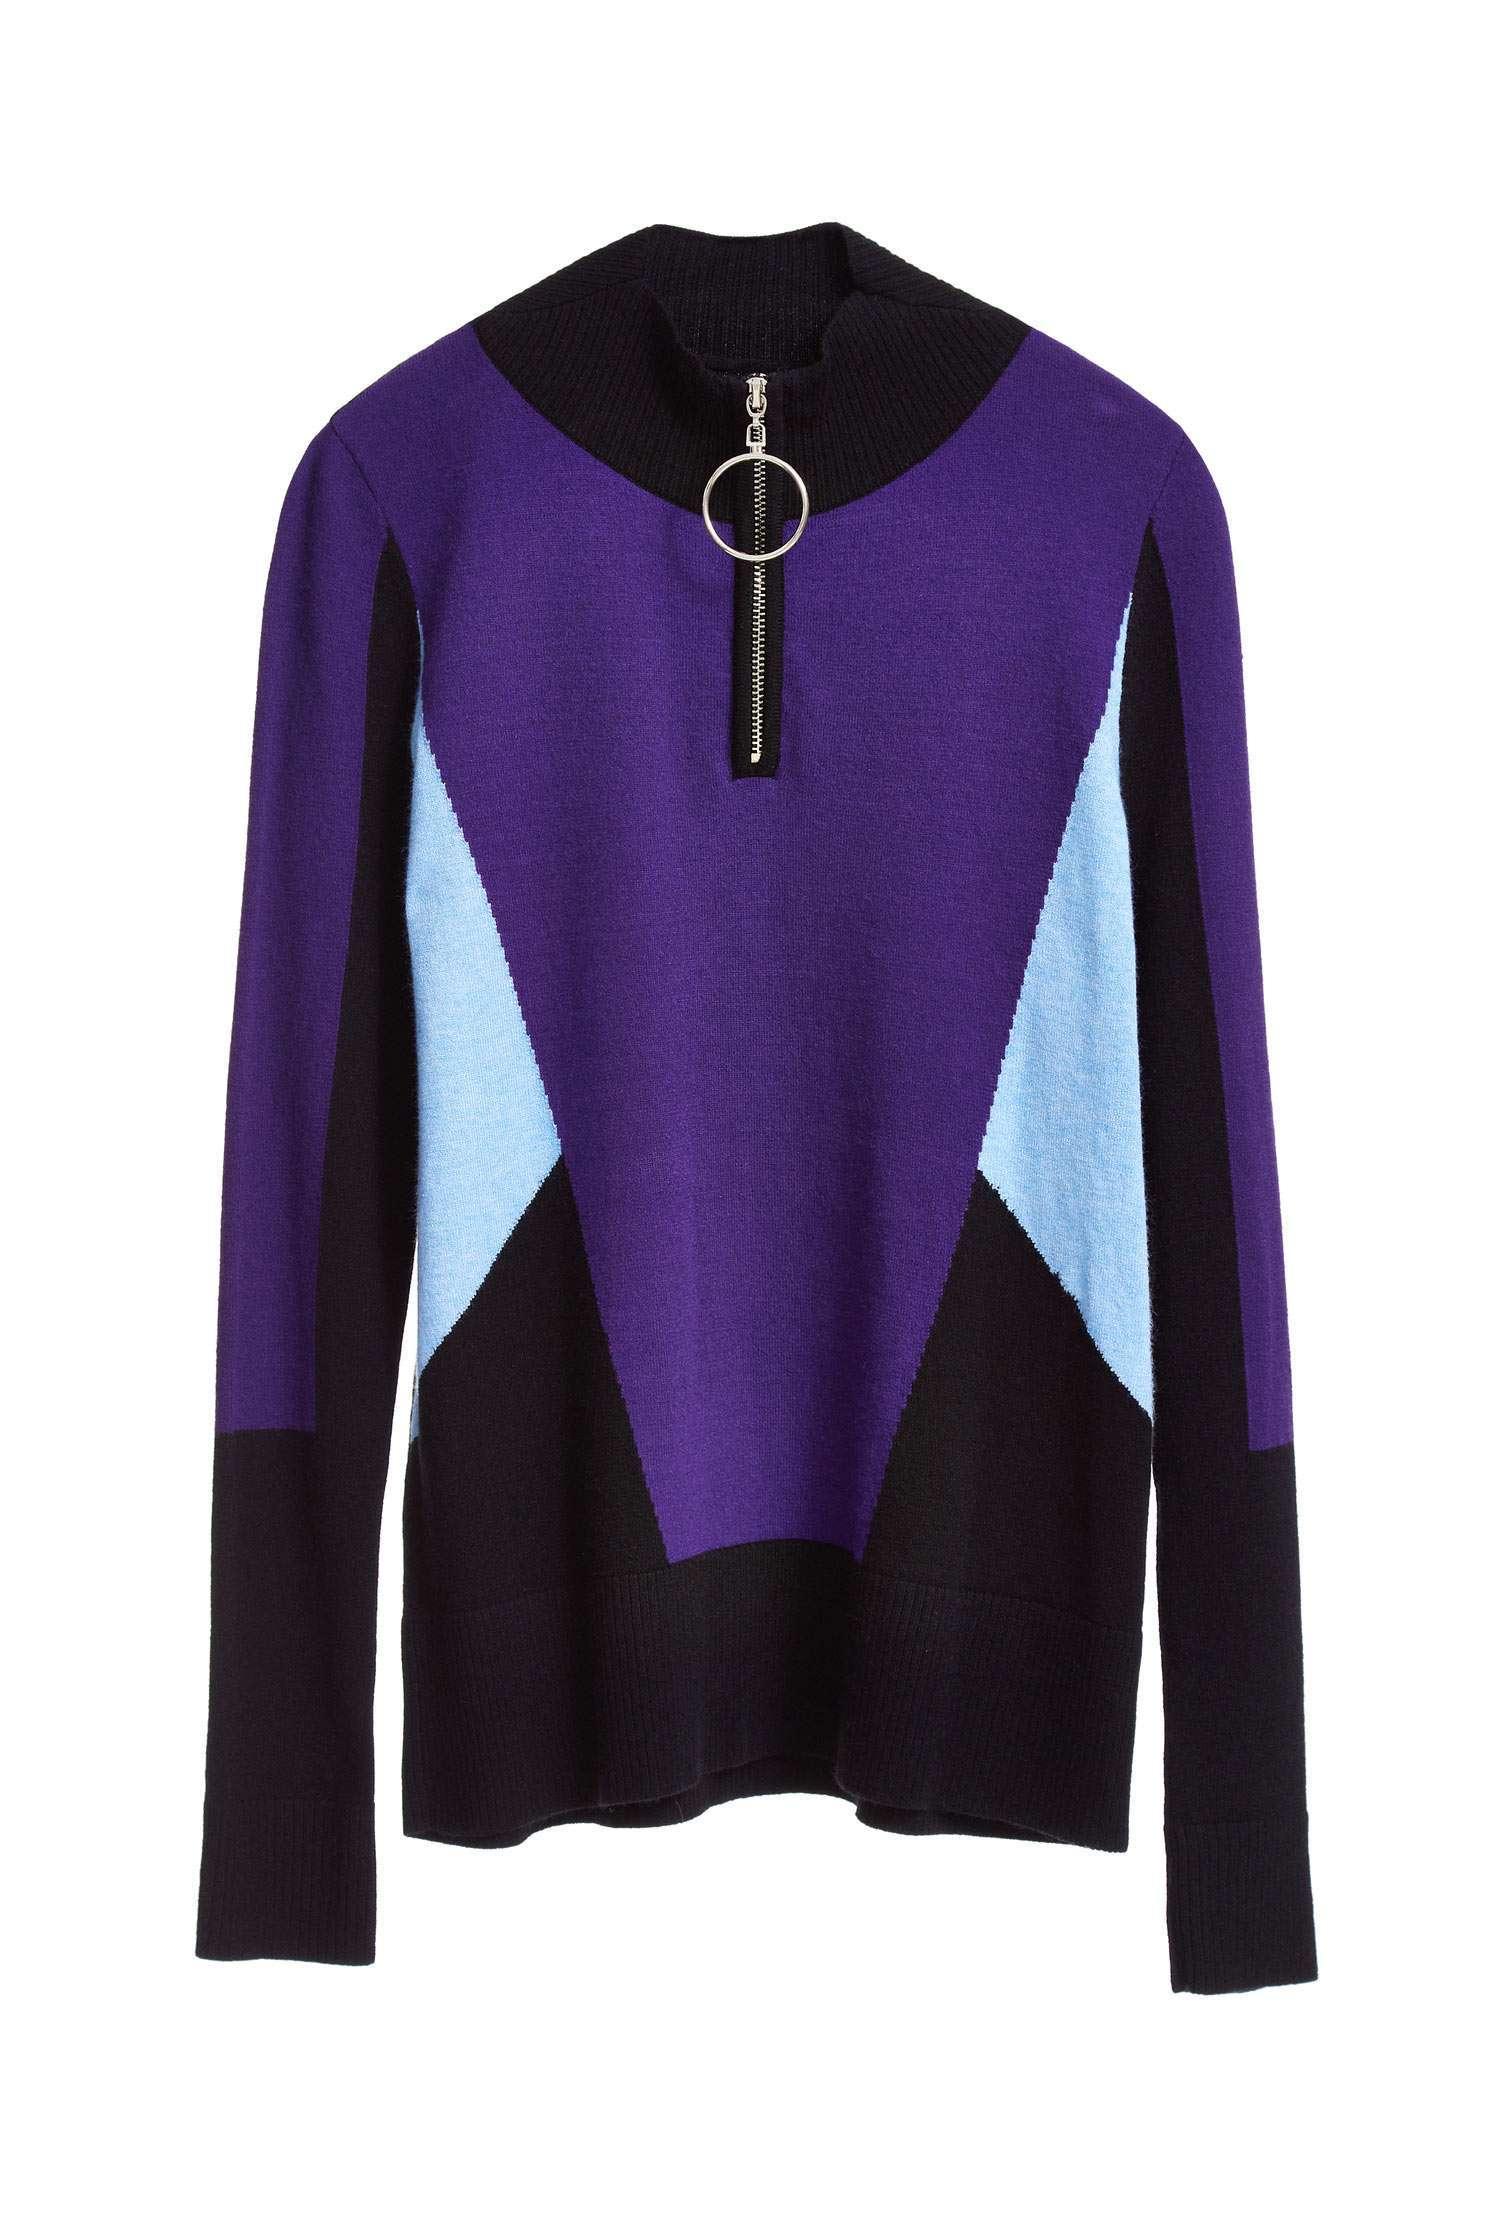 contrast color block knit sweater